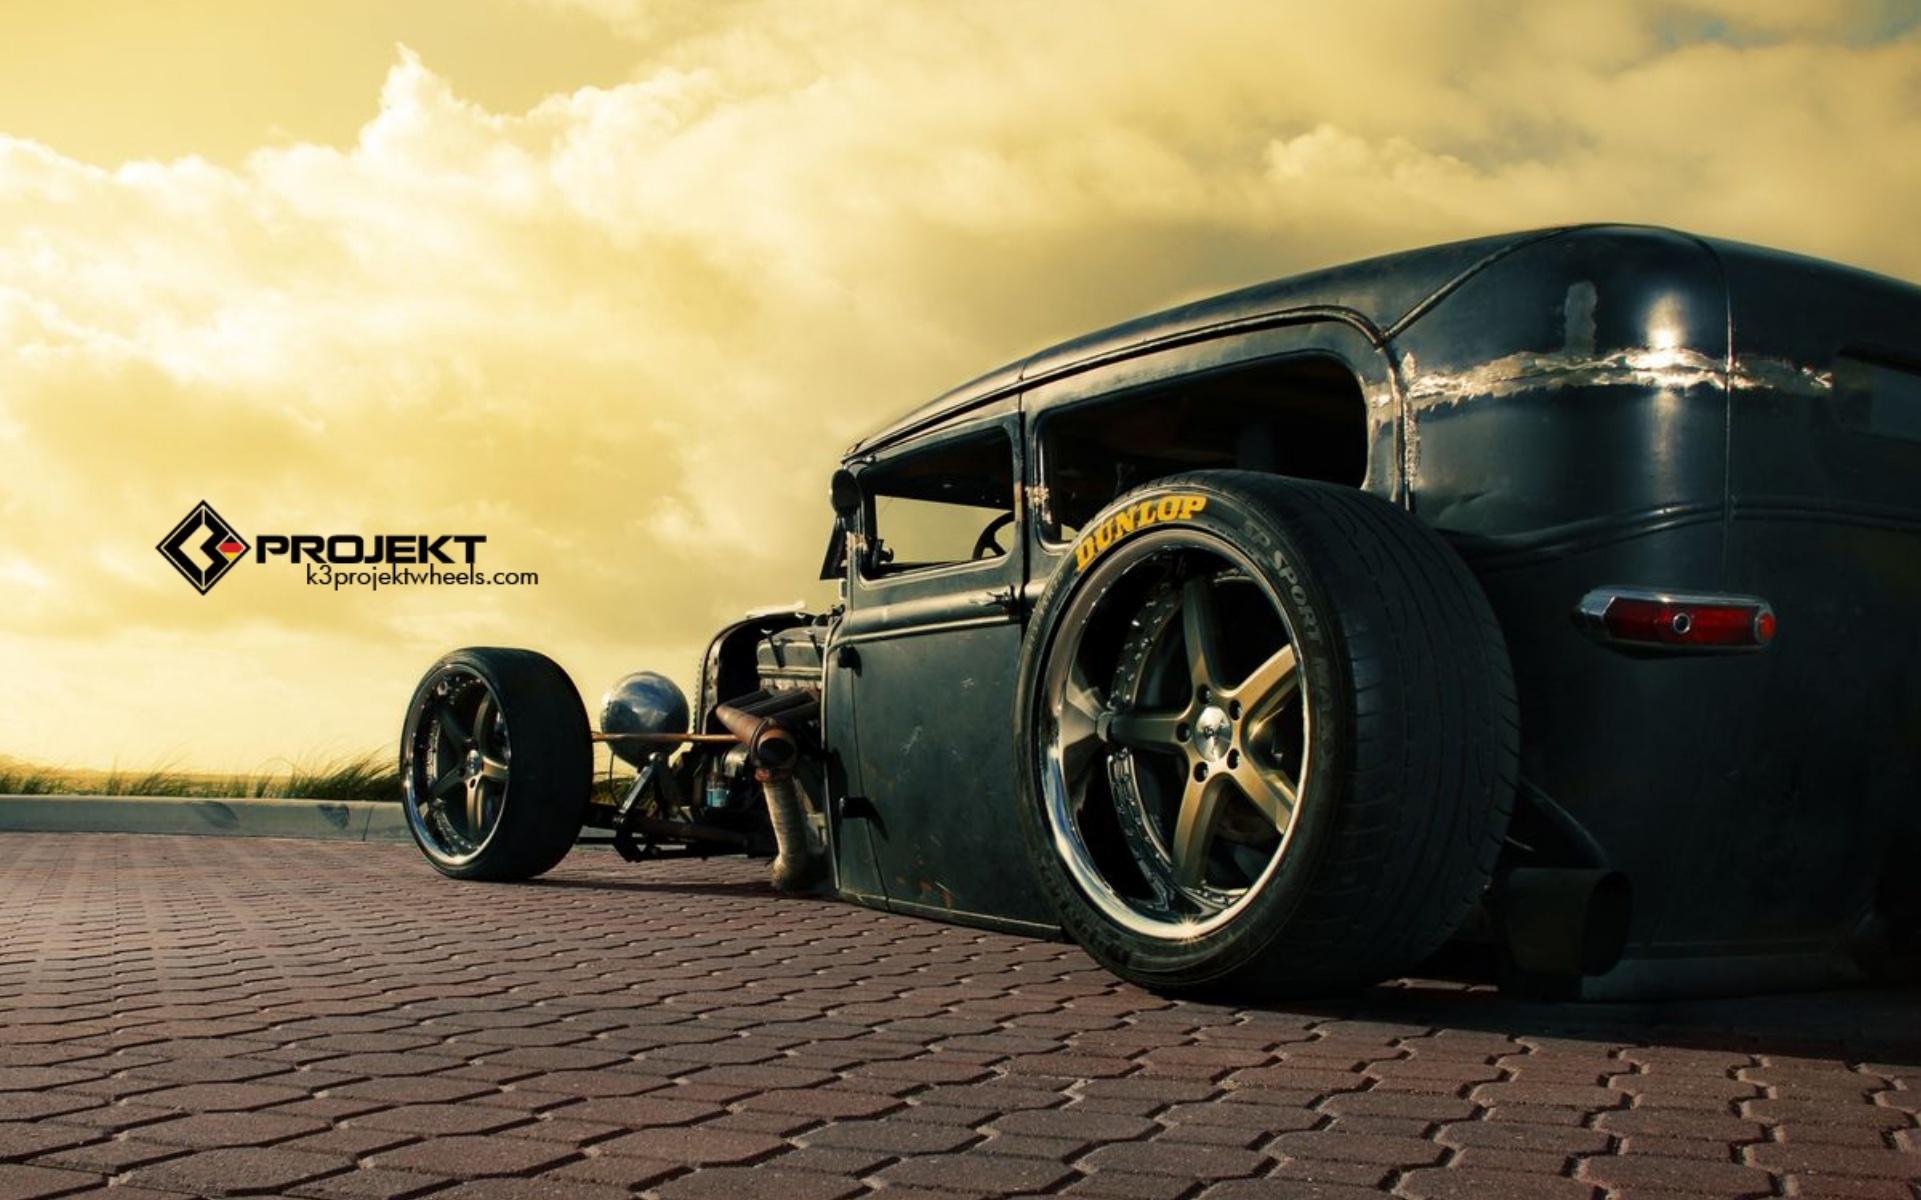 Ford Model T rat rod hot rods retro wheel wheels wallpaper background 1921x1200